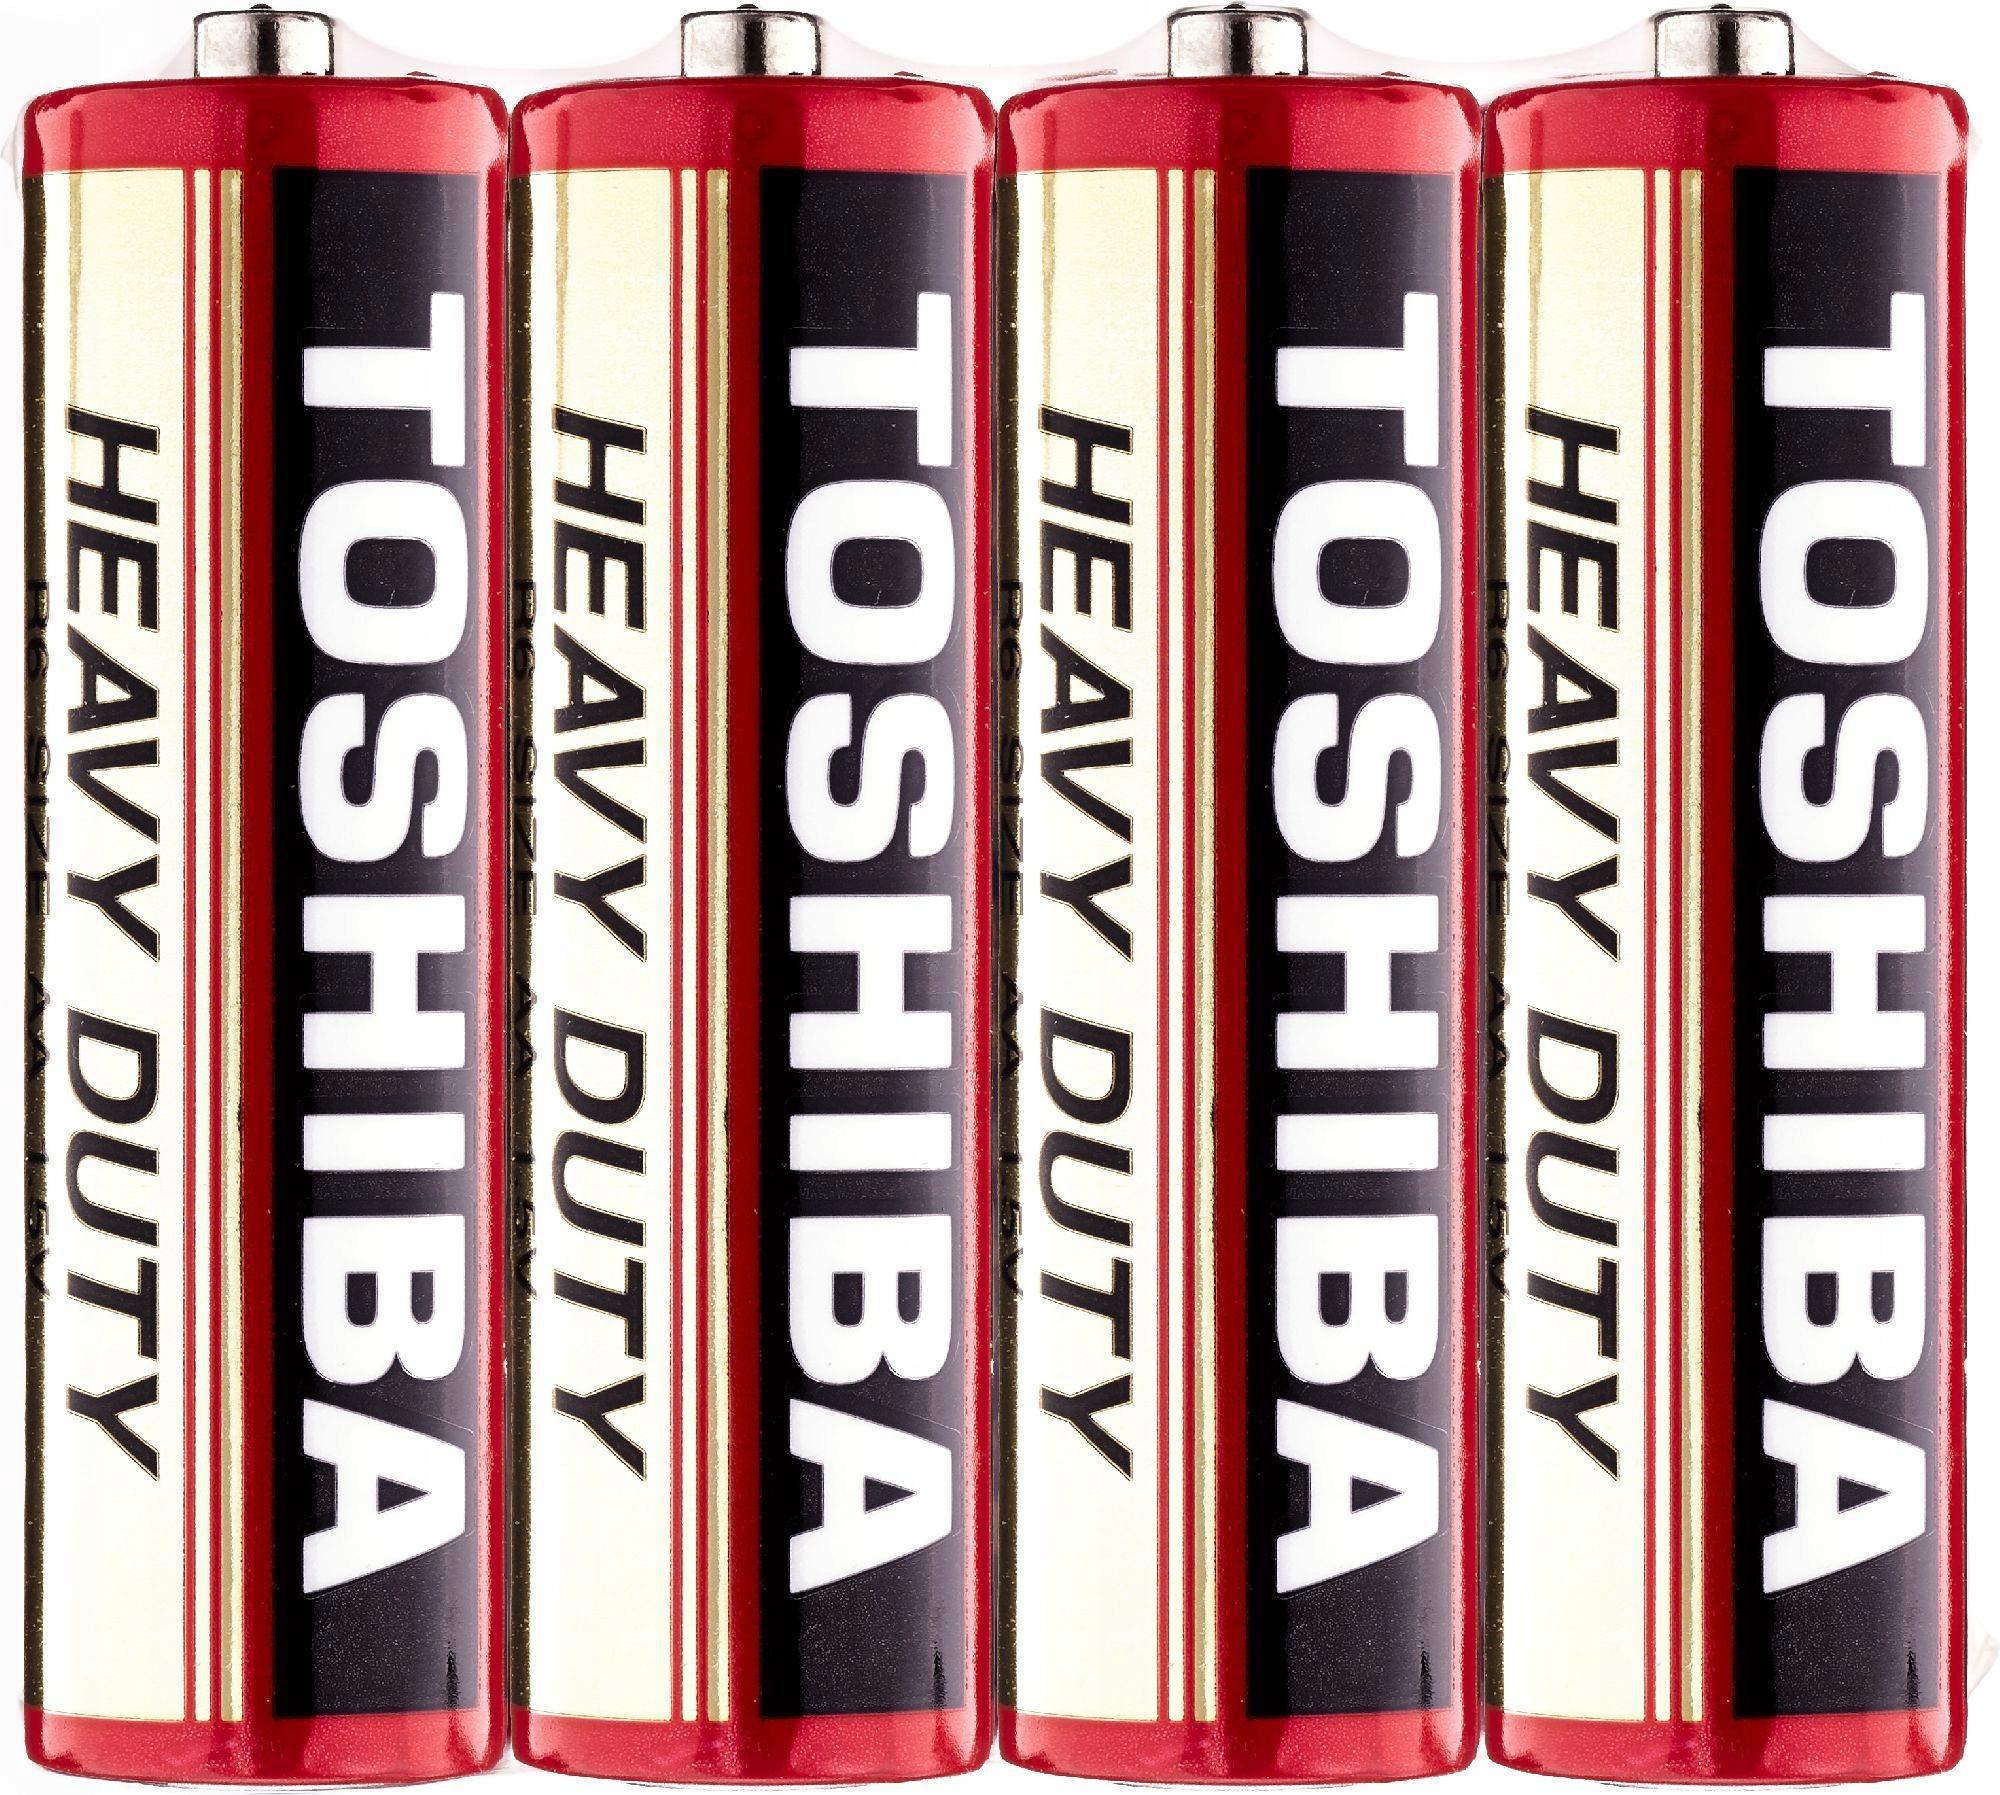 Toshiba Bateria cynkowo-węglowa R6 AA 1,5V HEAVY